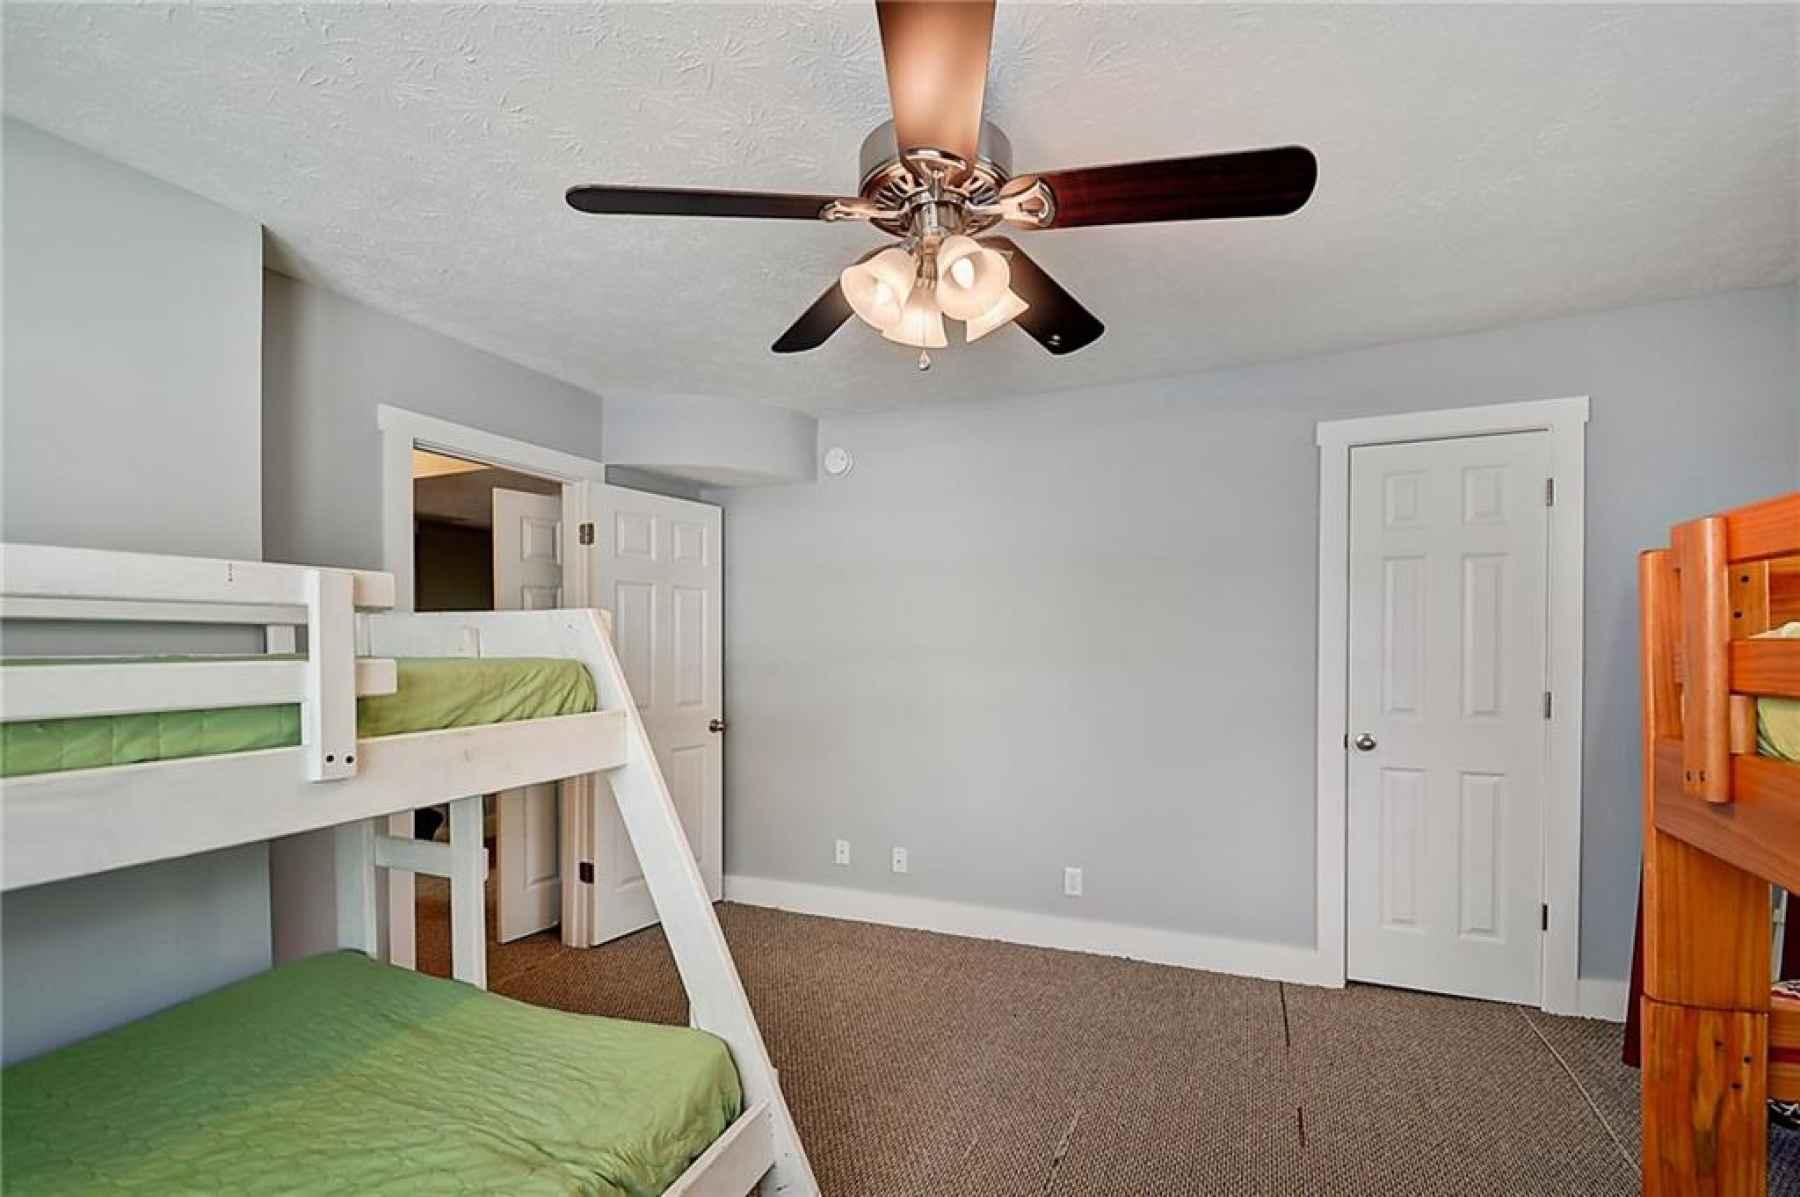 Second floor. Second bedroom located in the northeast corner of home. Closet door on the right side